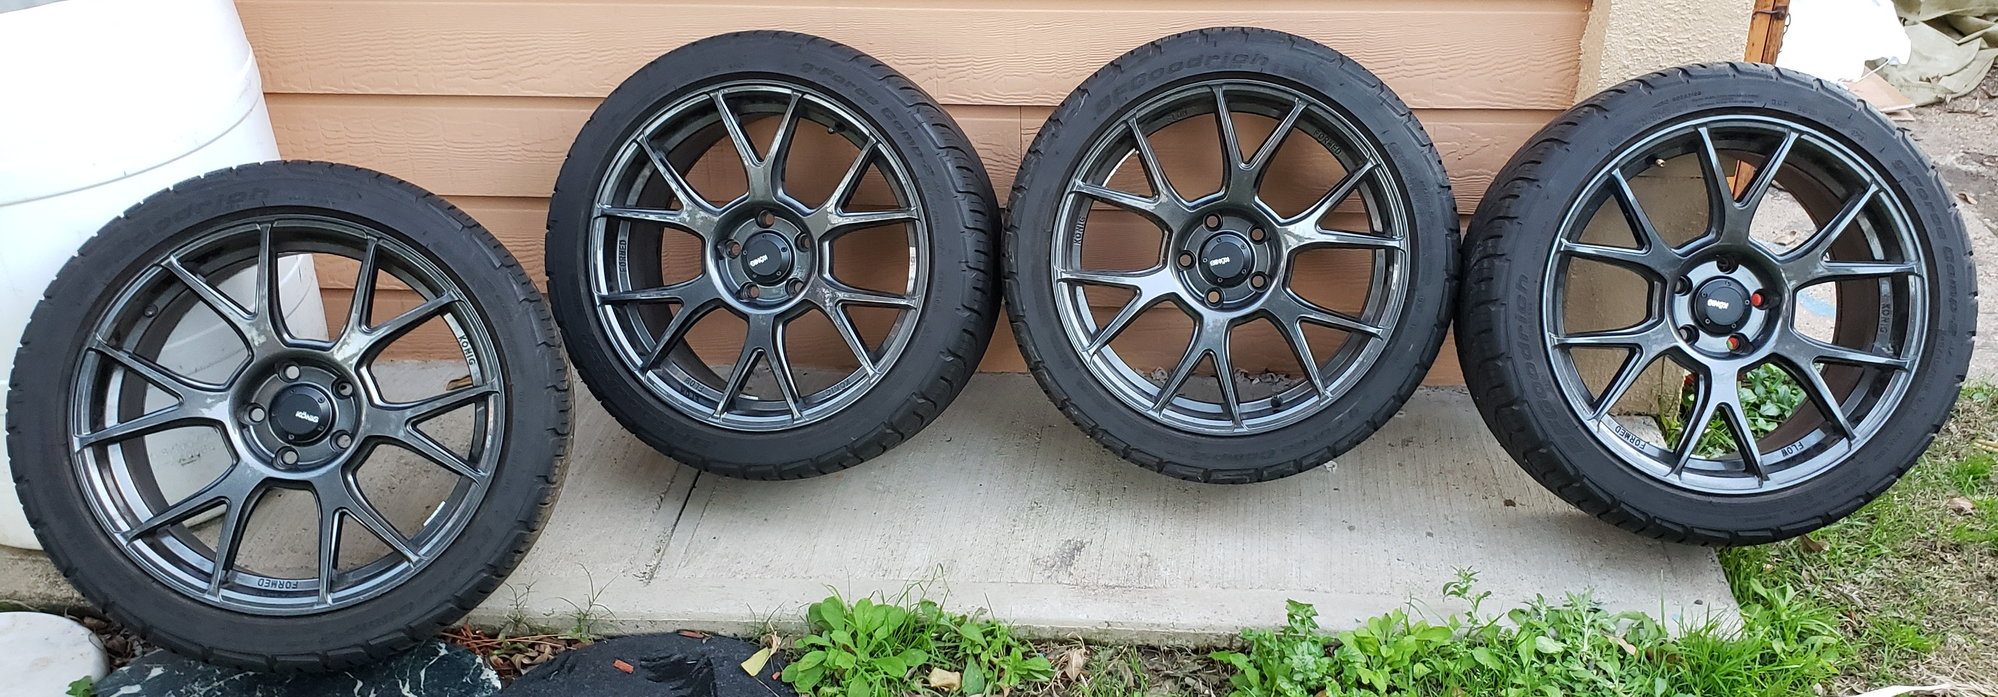 FS: 3rd Gen TL Parts For Sale